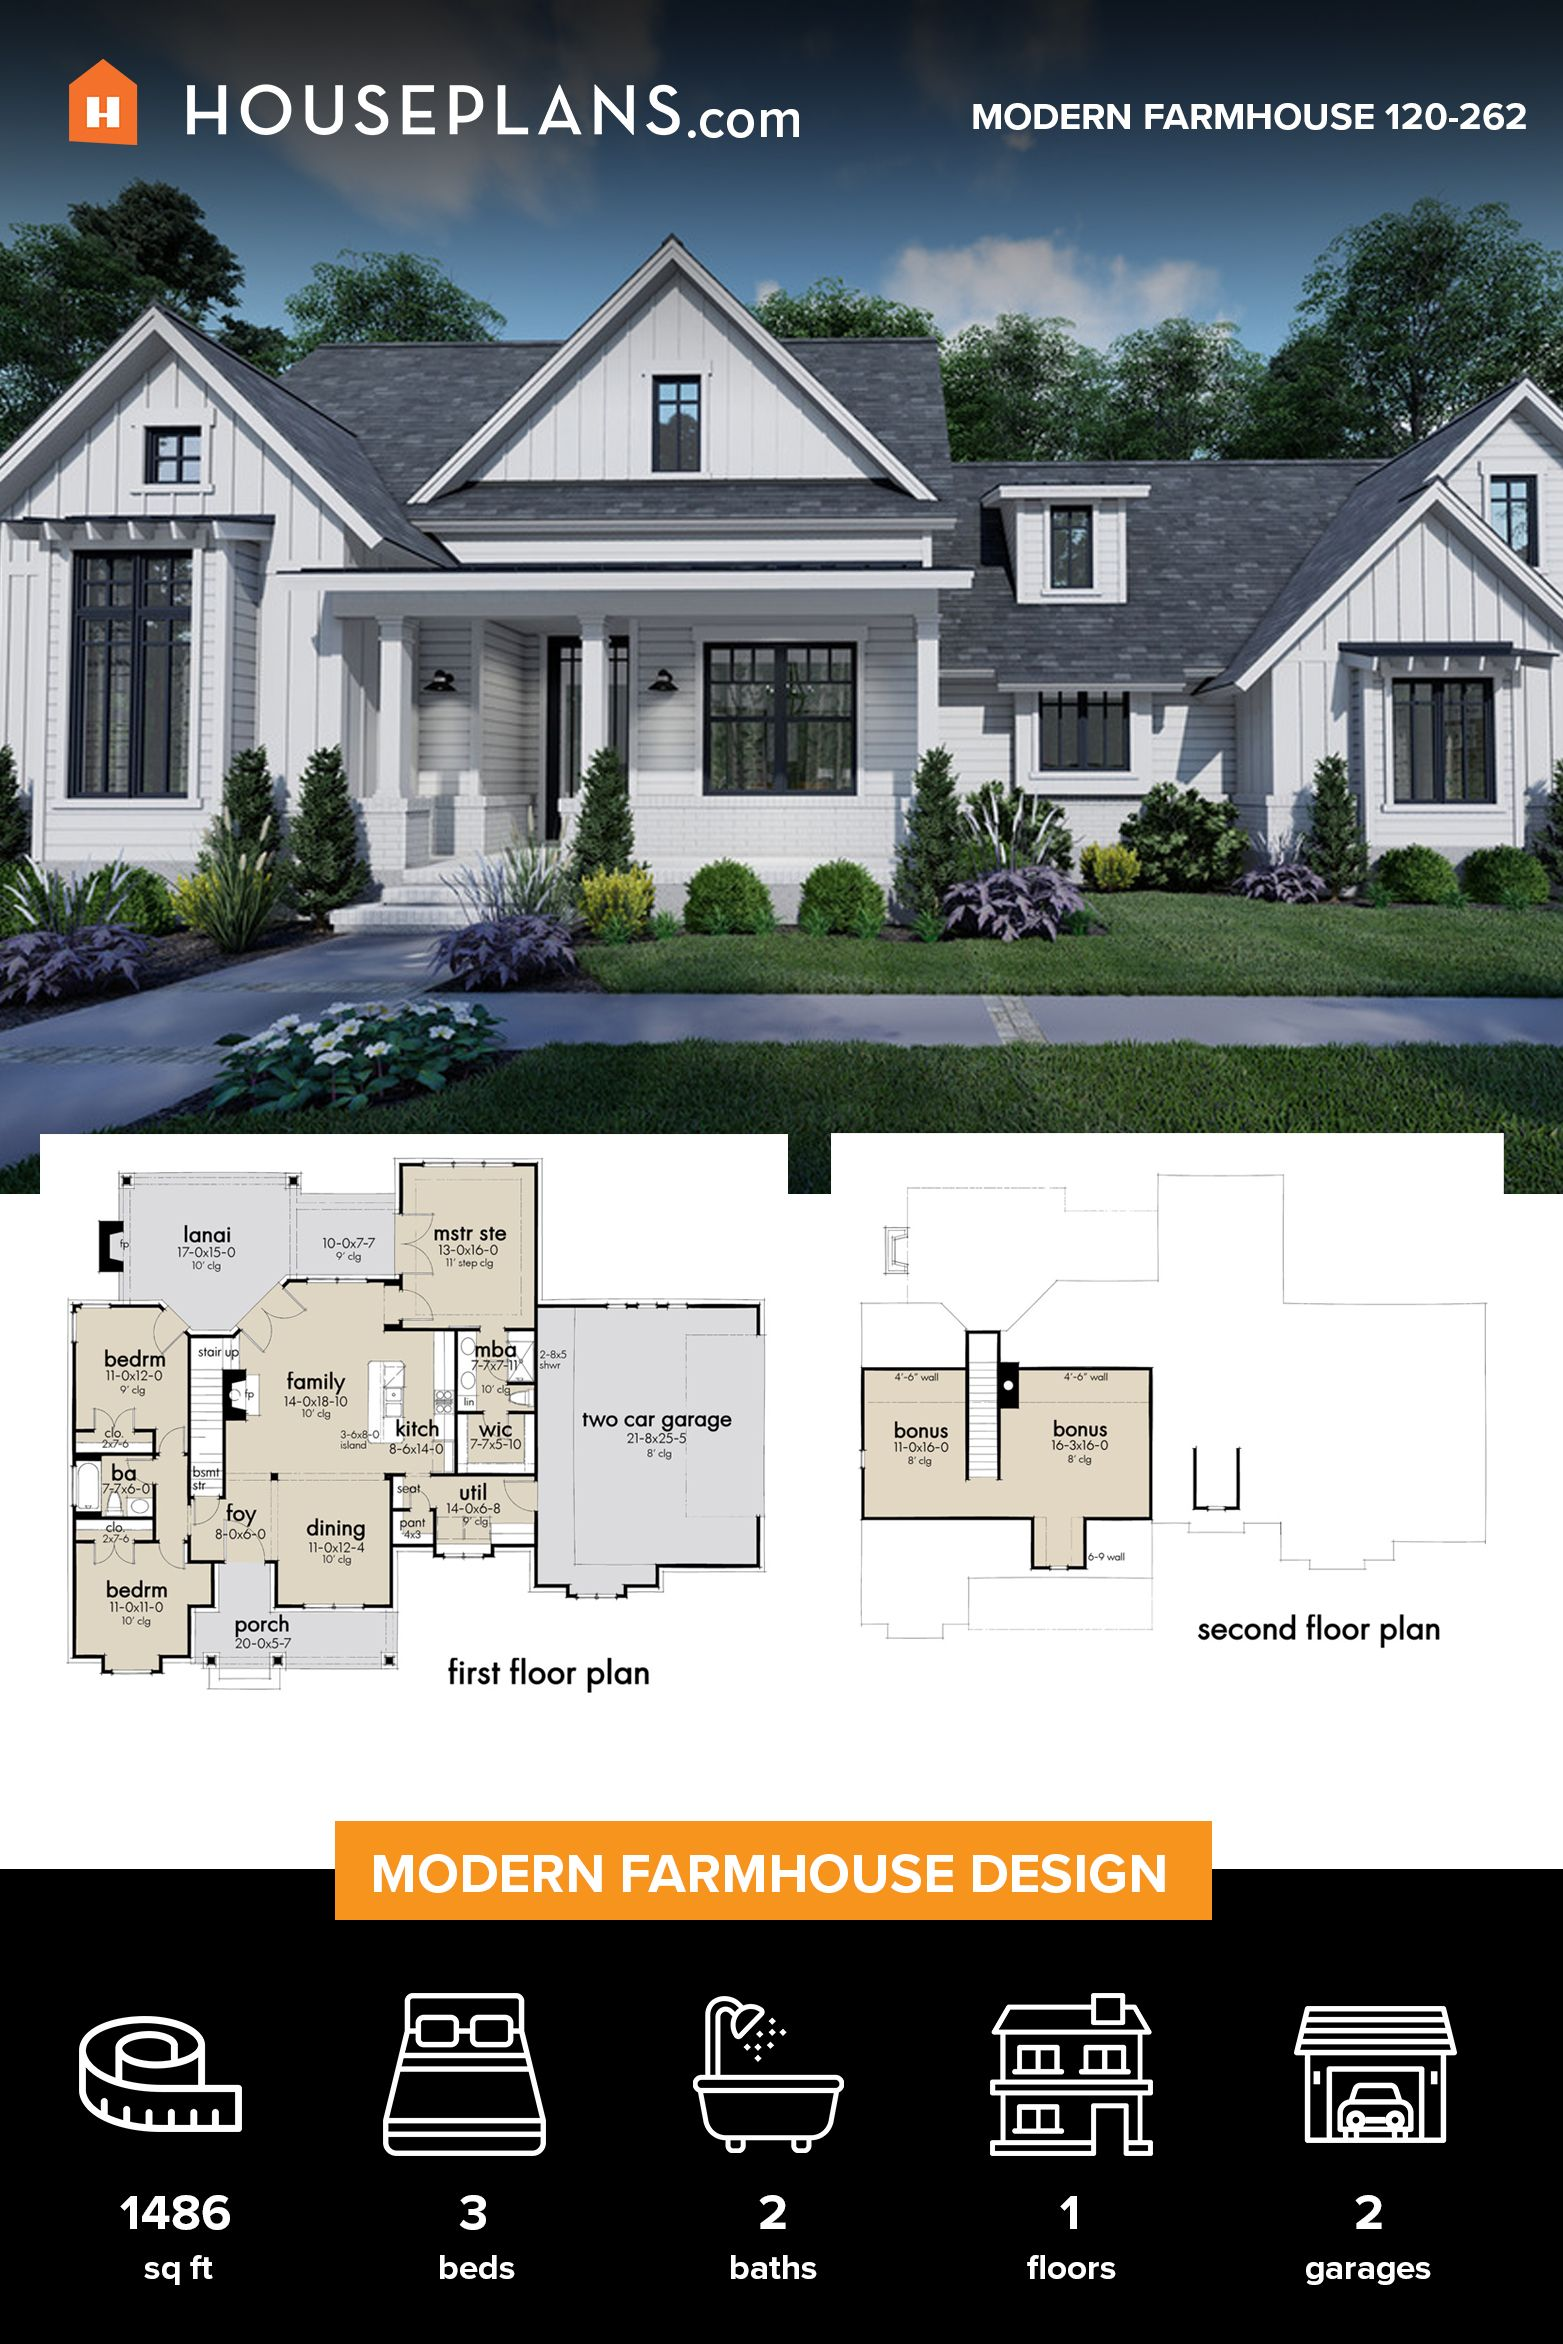 Farmhouse Style House Plan 3 Beds 2 Baths 1486 Sq Ft Plan 120 262 In 2020 Farmhouse Style House Plans Farmhouse Style House Modern Farmhouse Plans